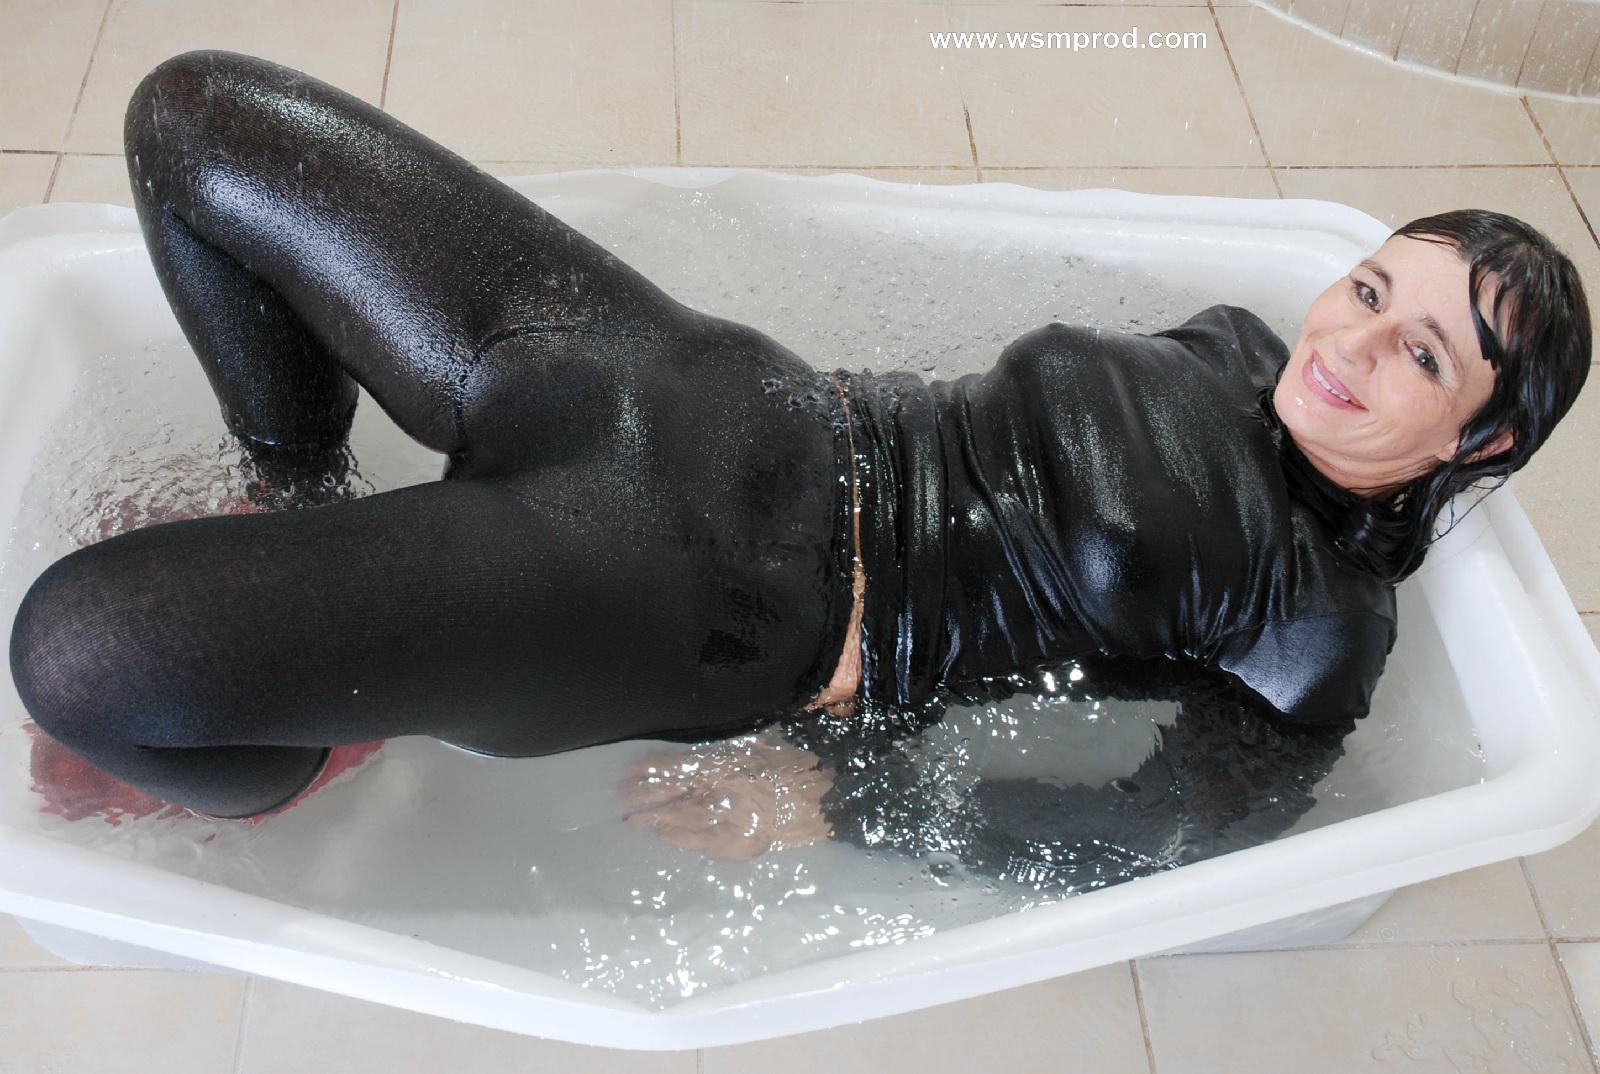 Sexy wet look hot pants, wet look pants, sexy wet look shorts, sexy sh